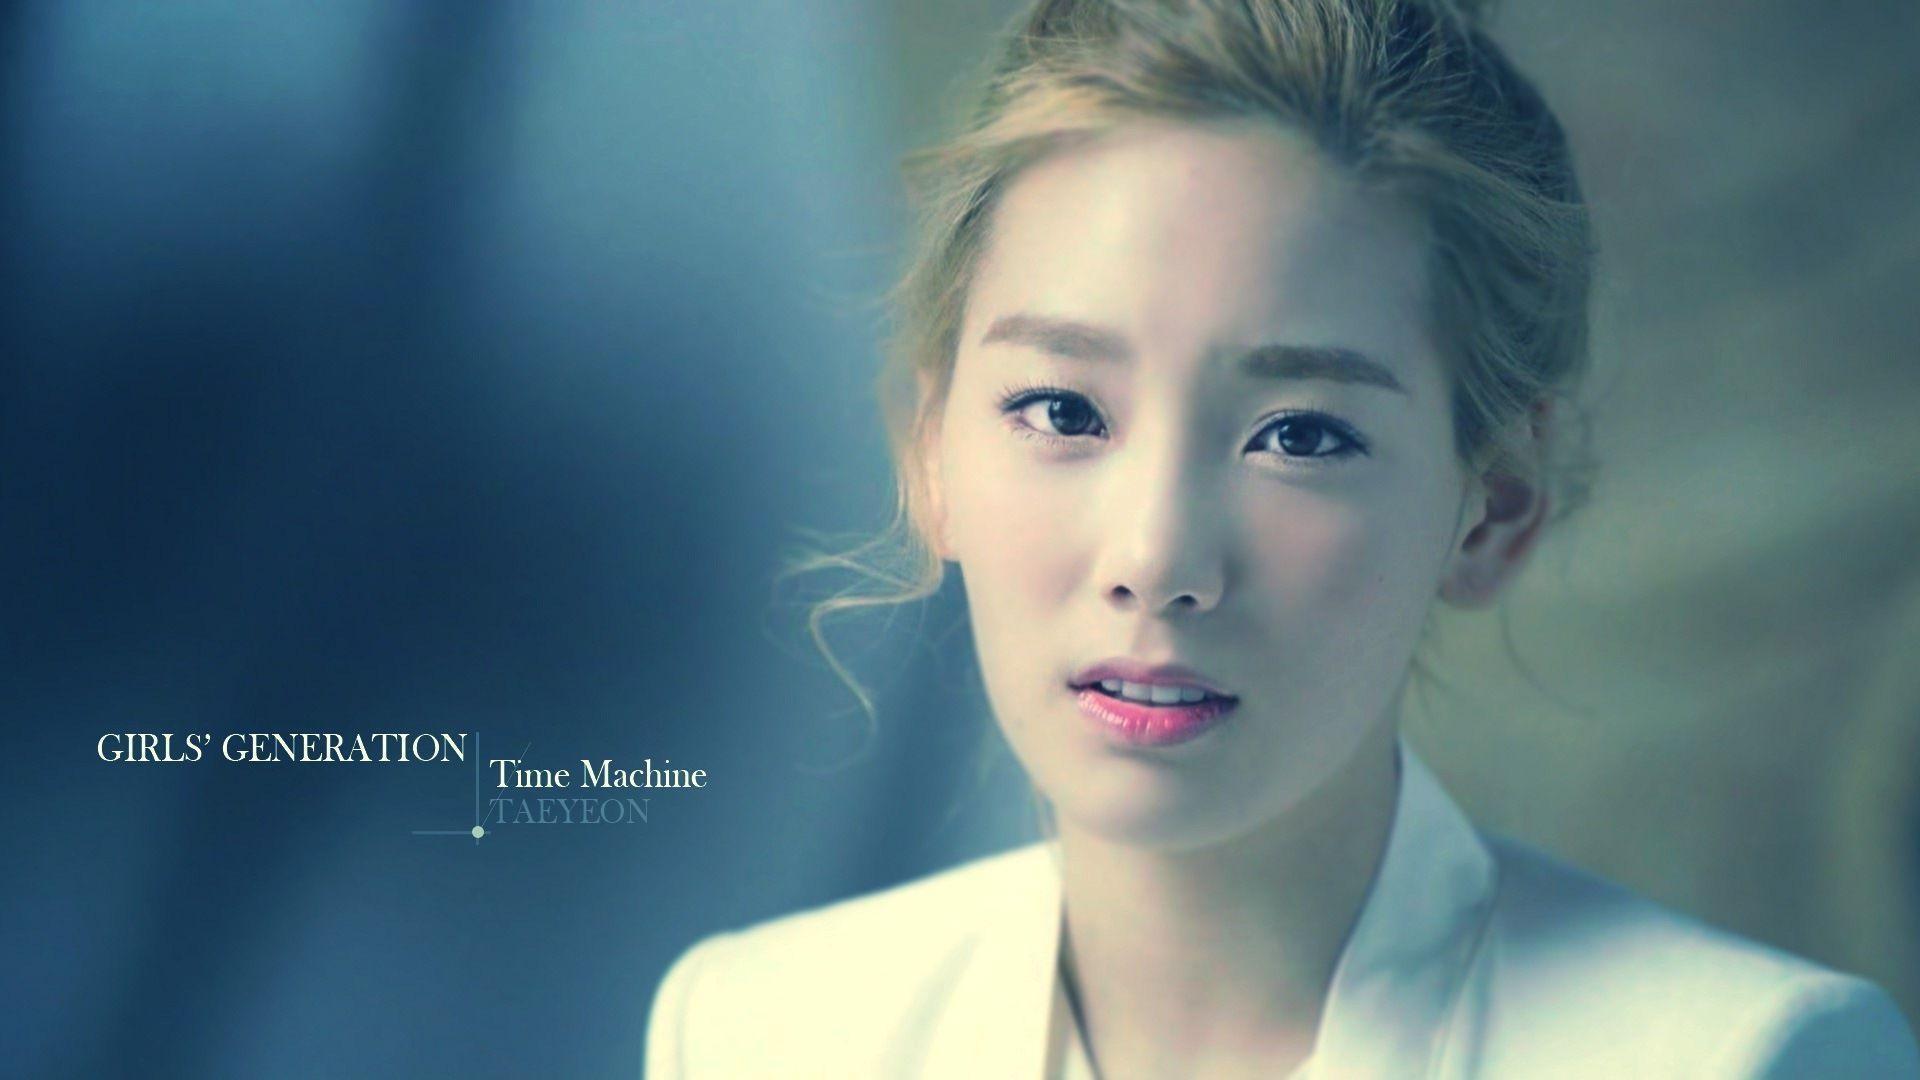 Taeyeon Wallpapers Group